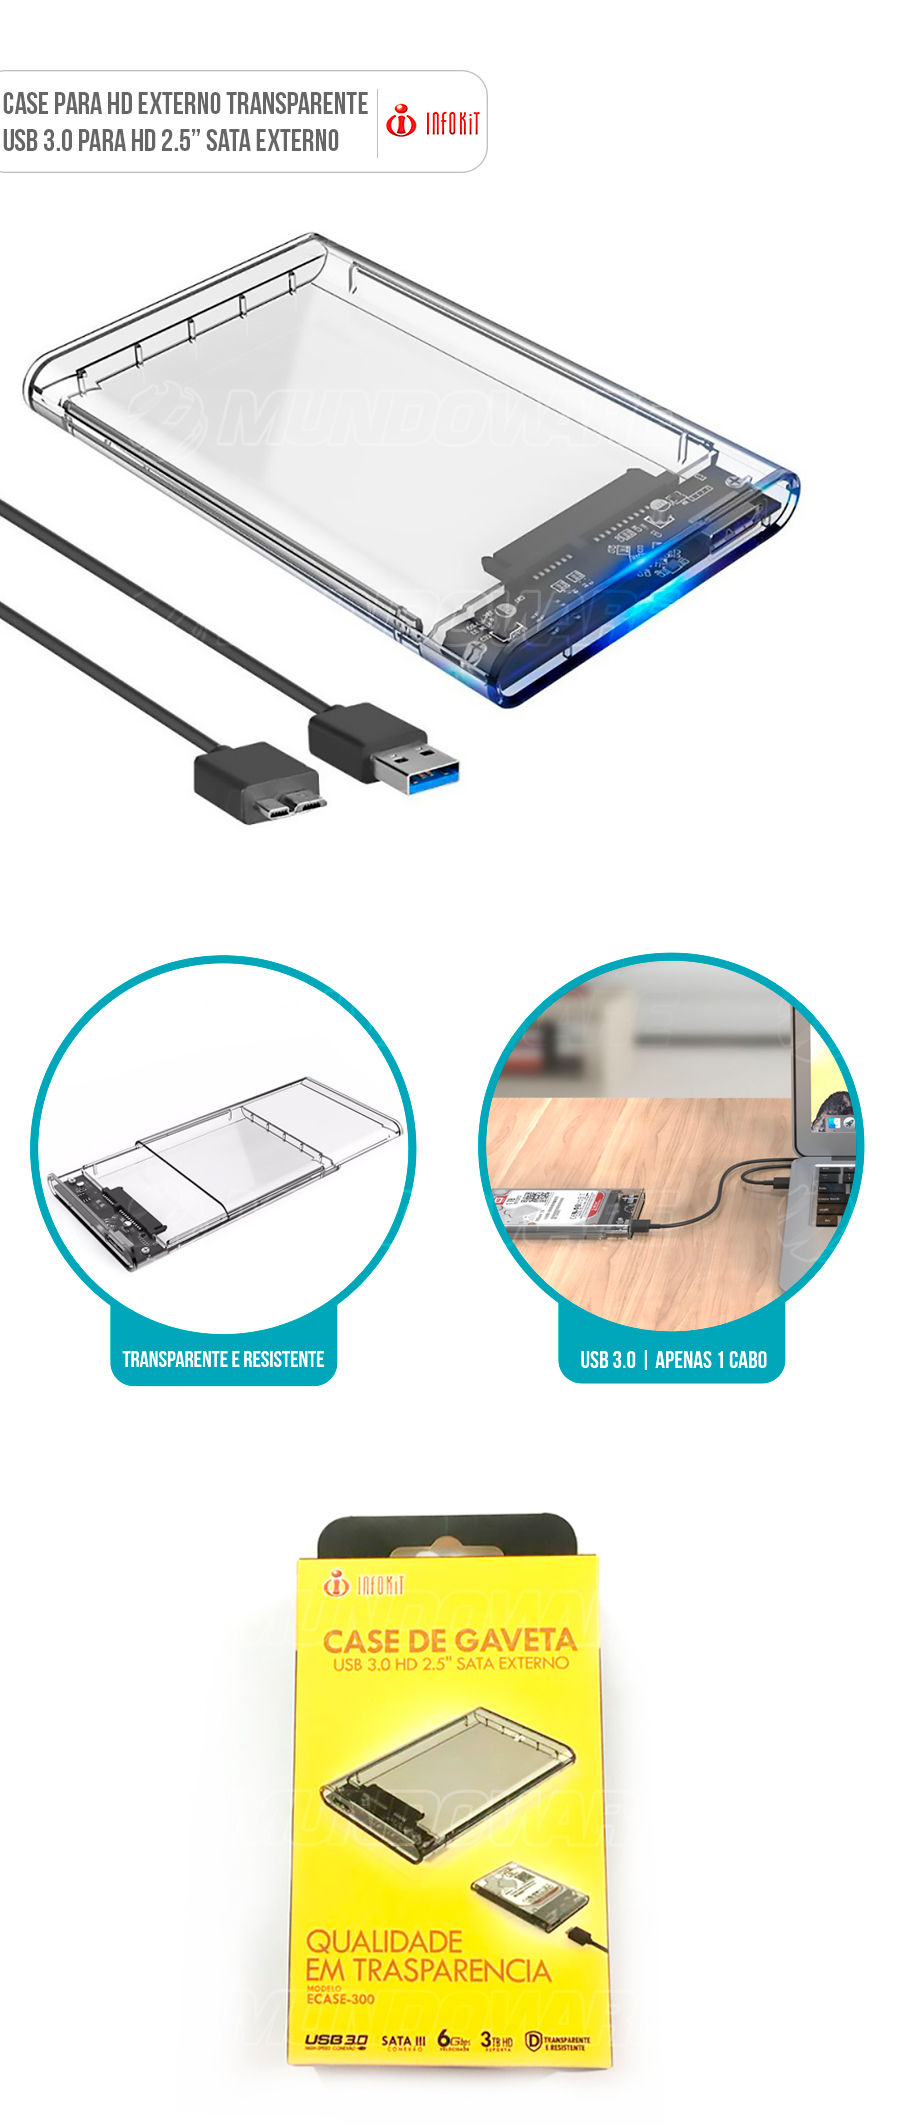 Case para HD Externo SATA 2.5 usb 3.0 transparente